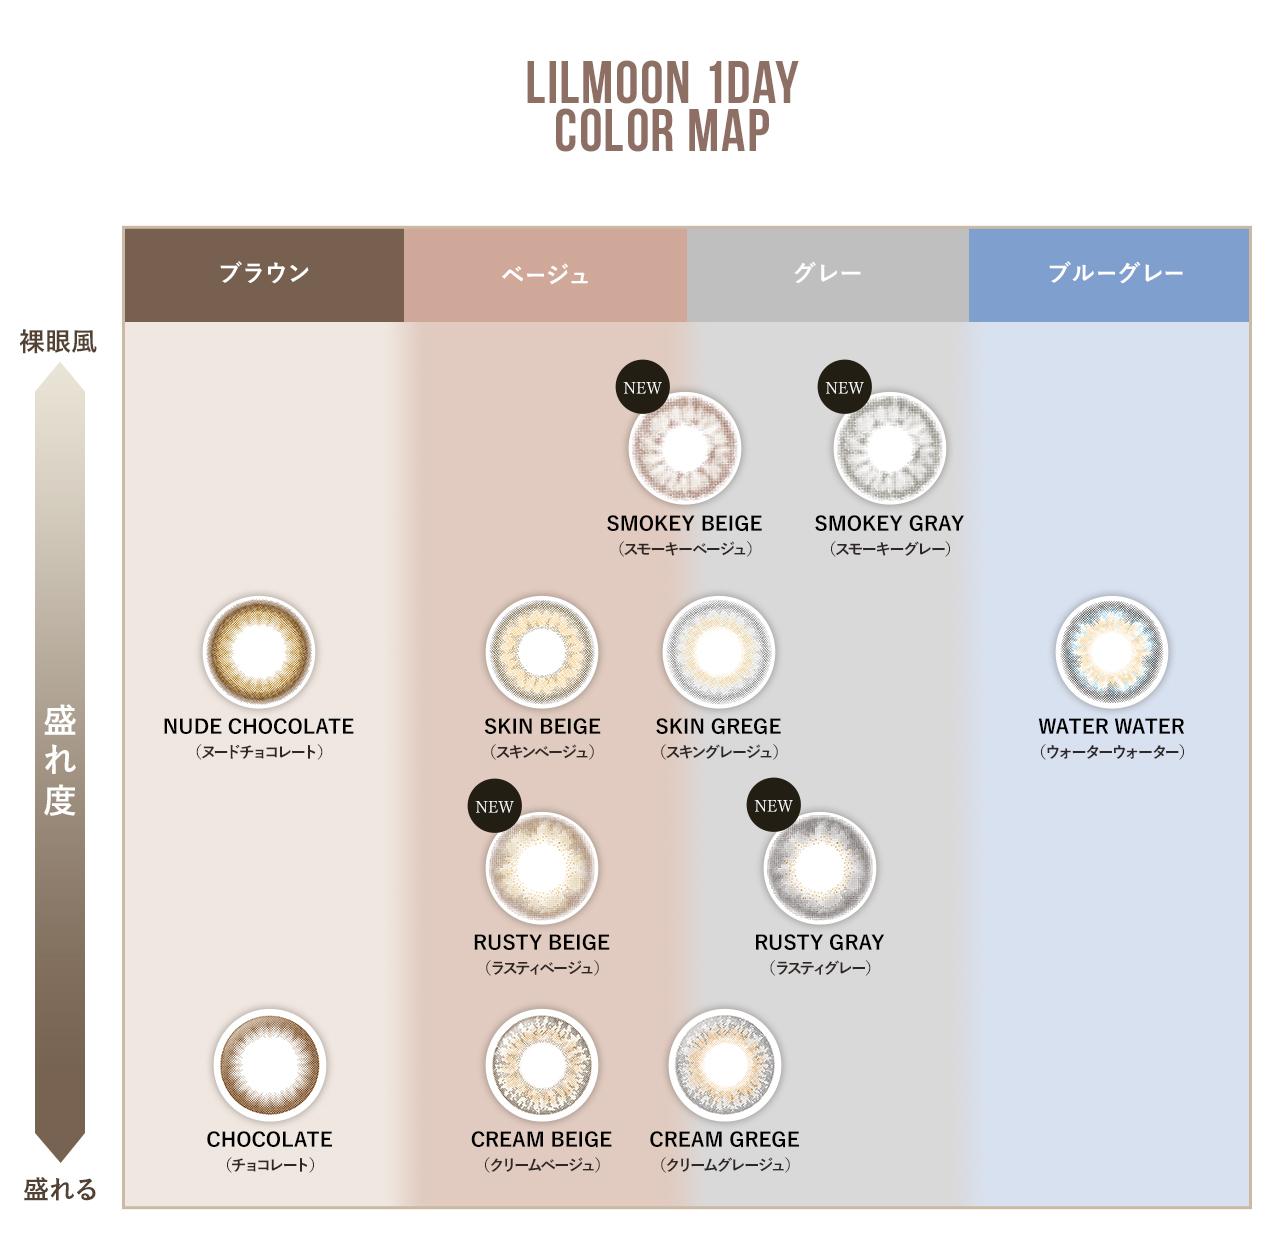 LILMOON10